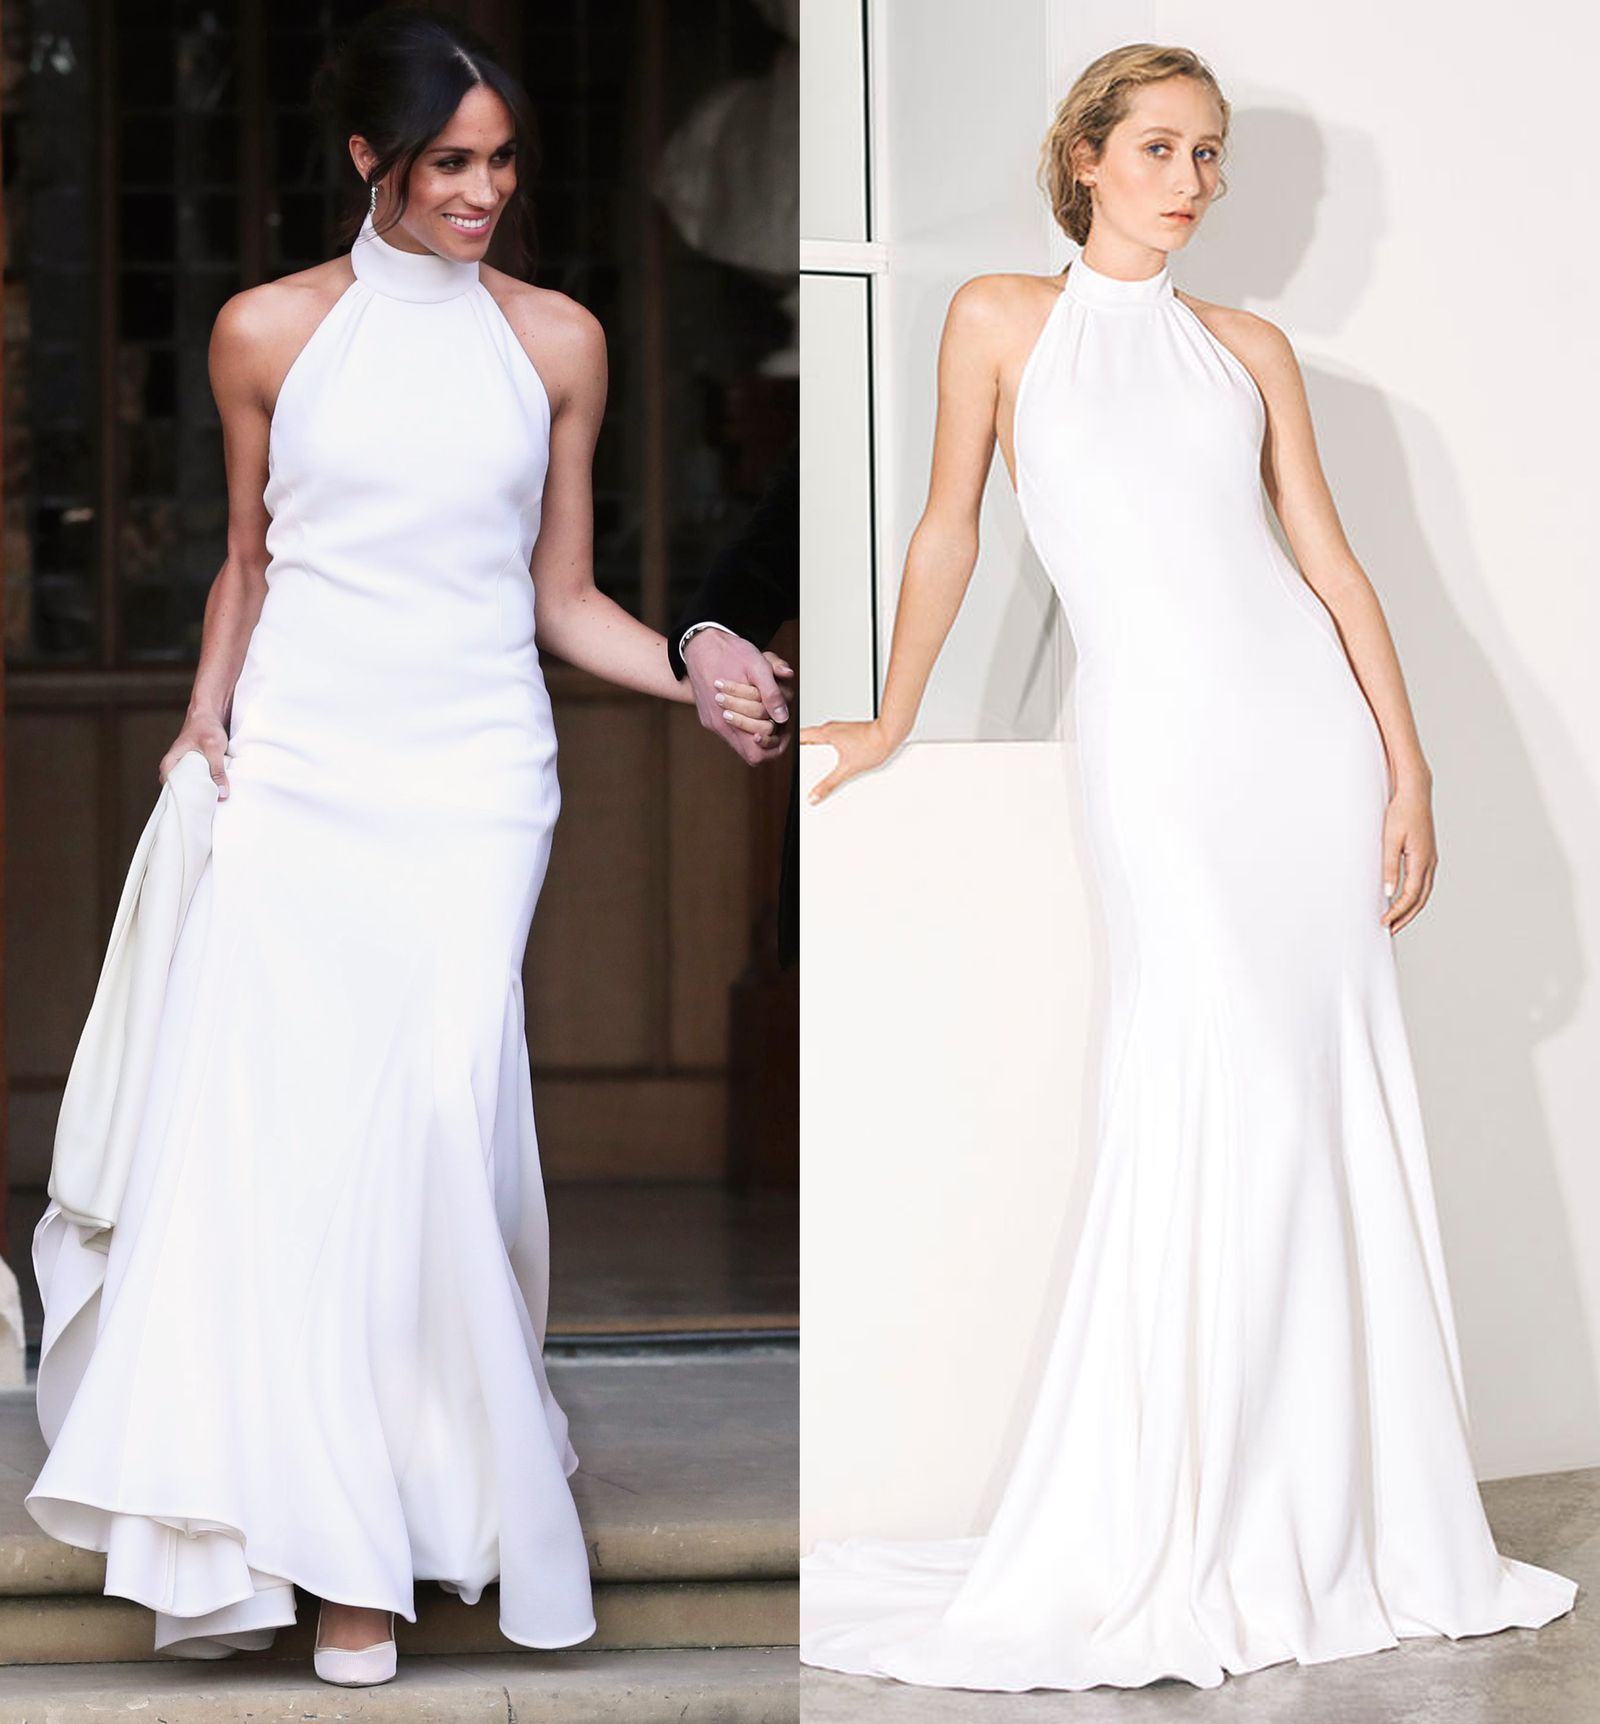 Stella Mccartney S New Bridal Collection Includes Meghan Markle S Wedding Dress Meghan Markle Wedding Dress After Wedding Dress Wedding Dresses [ 1724 x 1600 Pixel ]